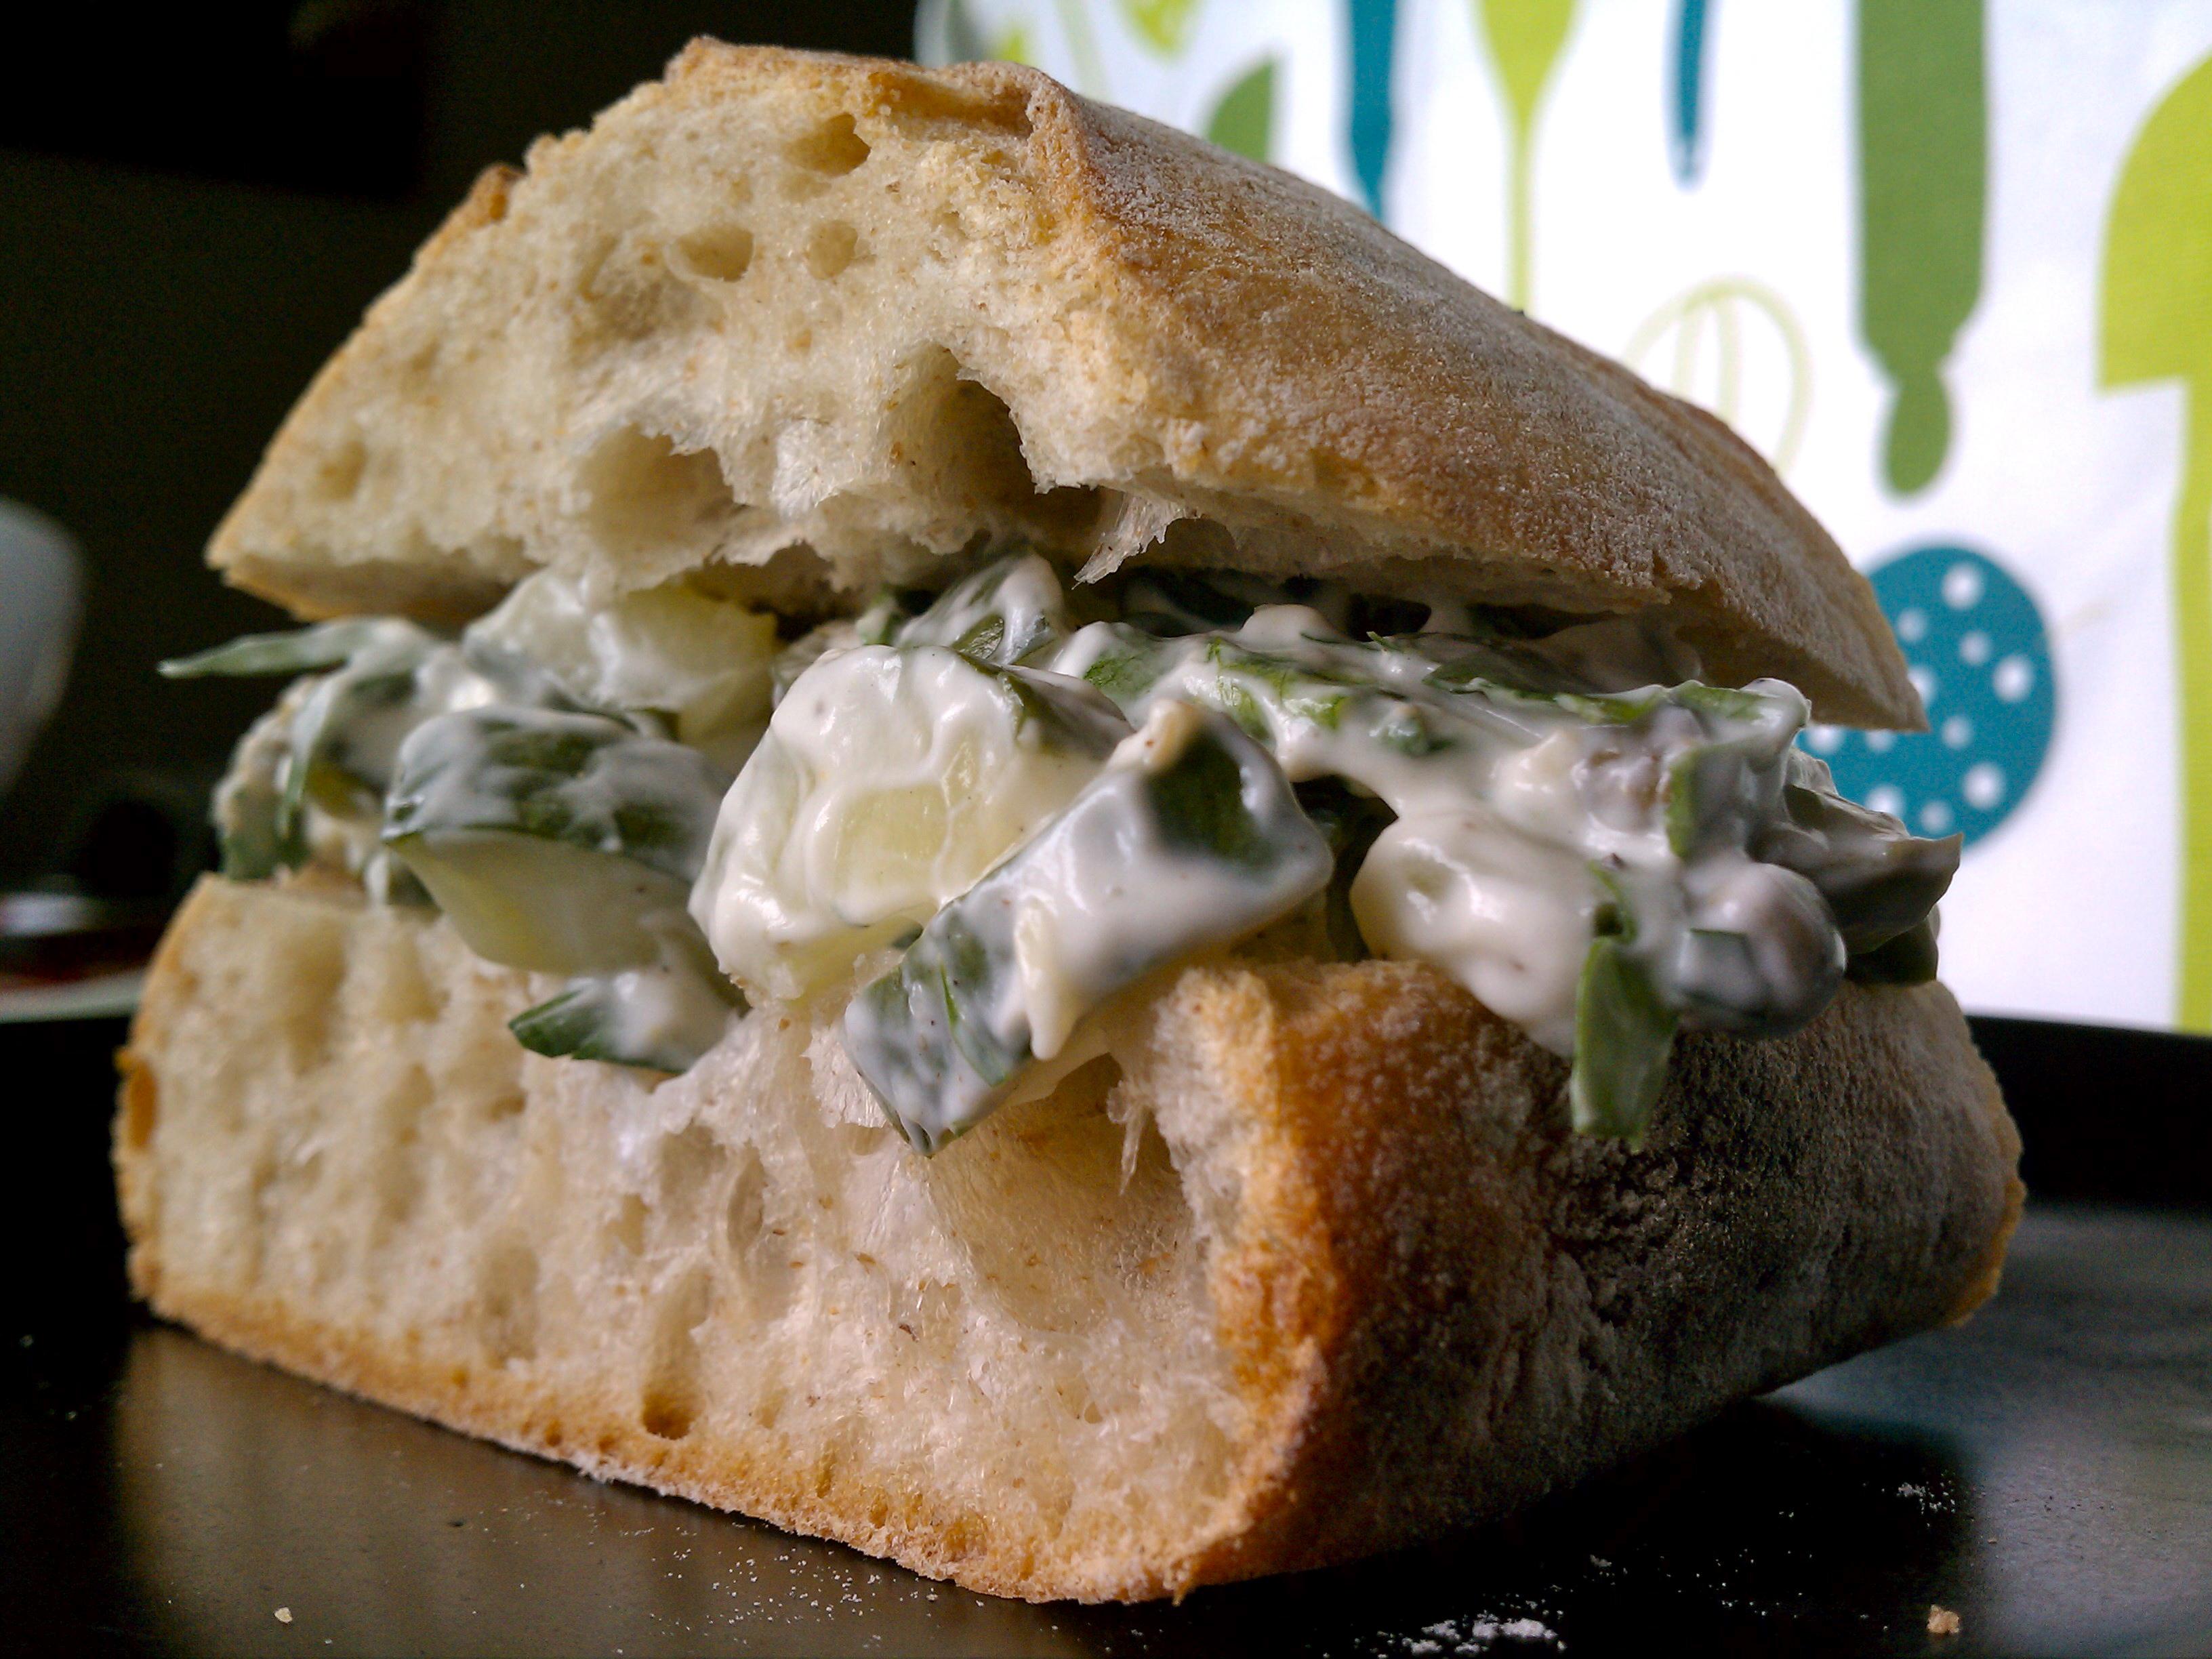 Cucumber sandwiches rezept